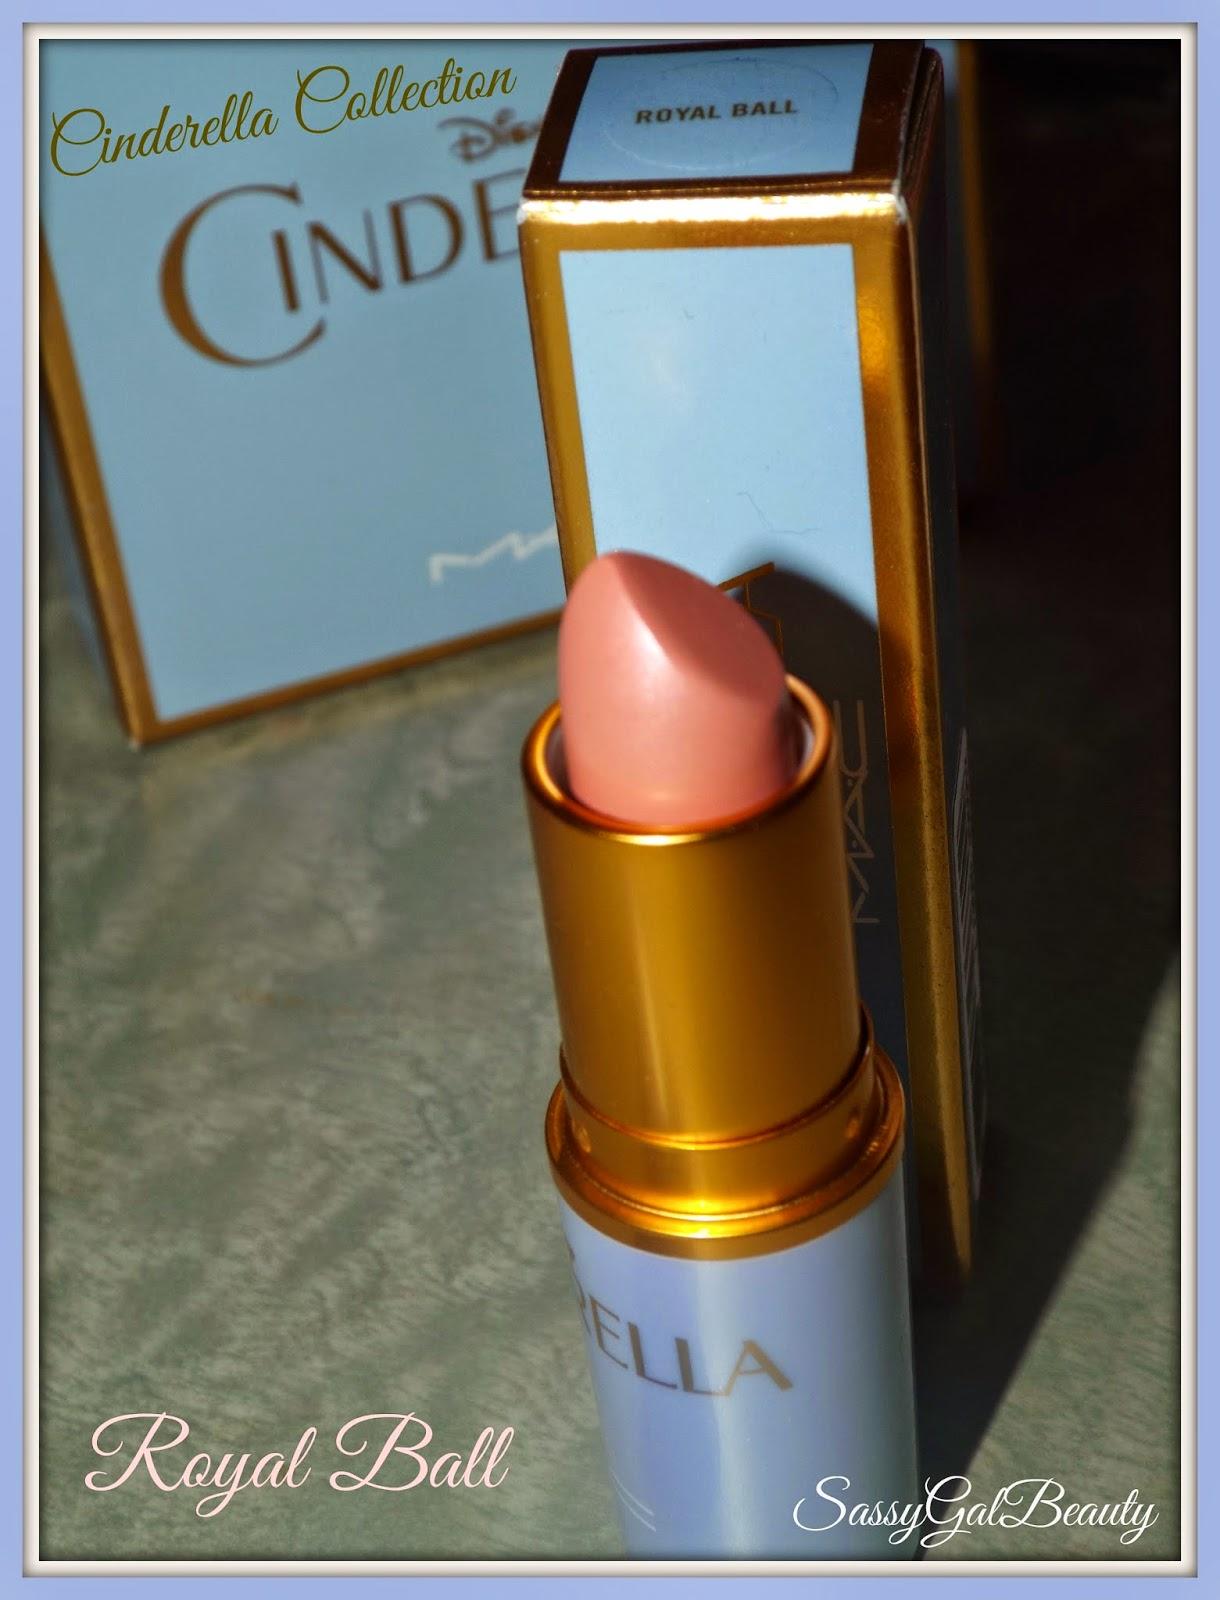 M.A.C. Cinderella Collection: Royal Ball Lipstick